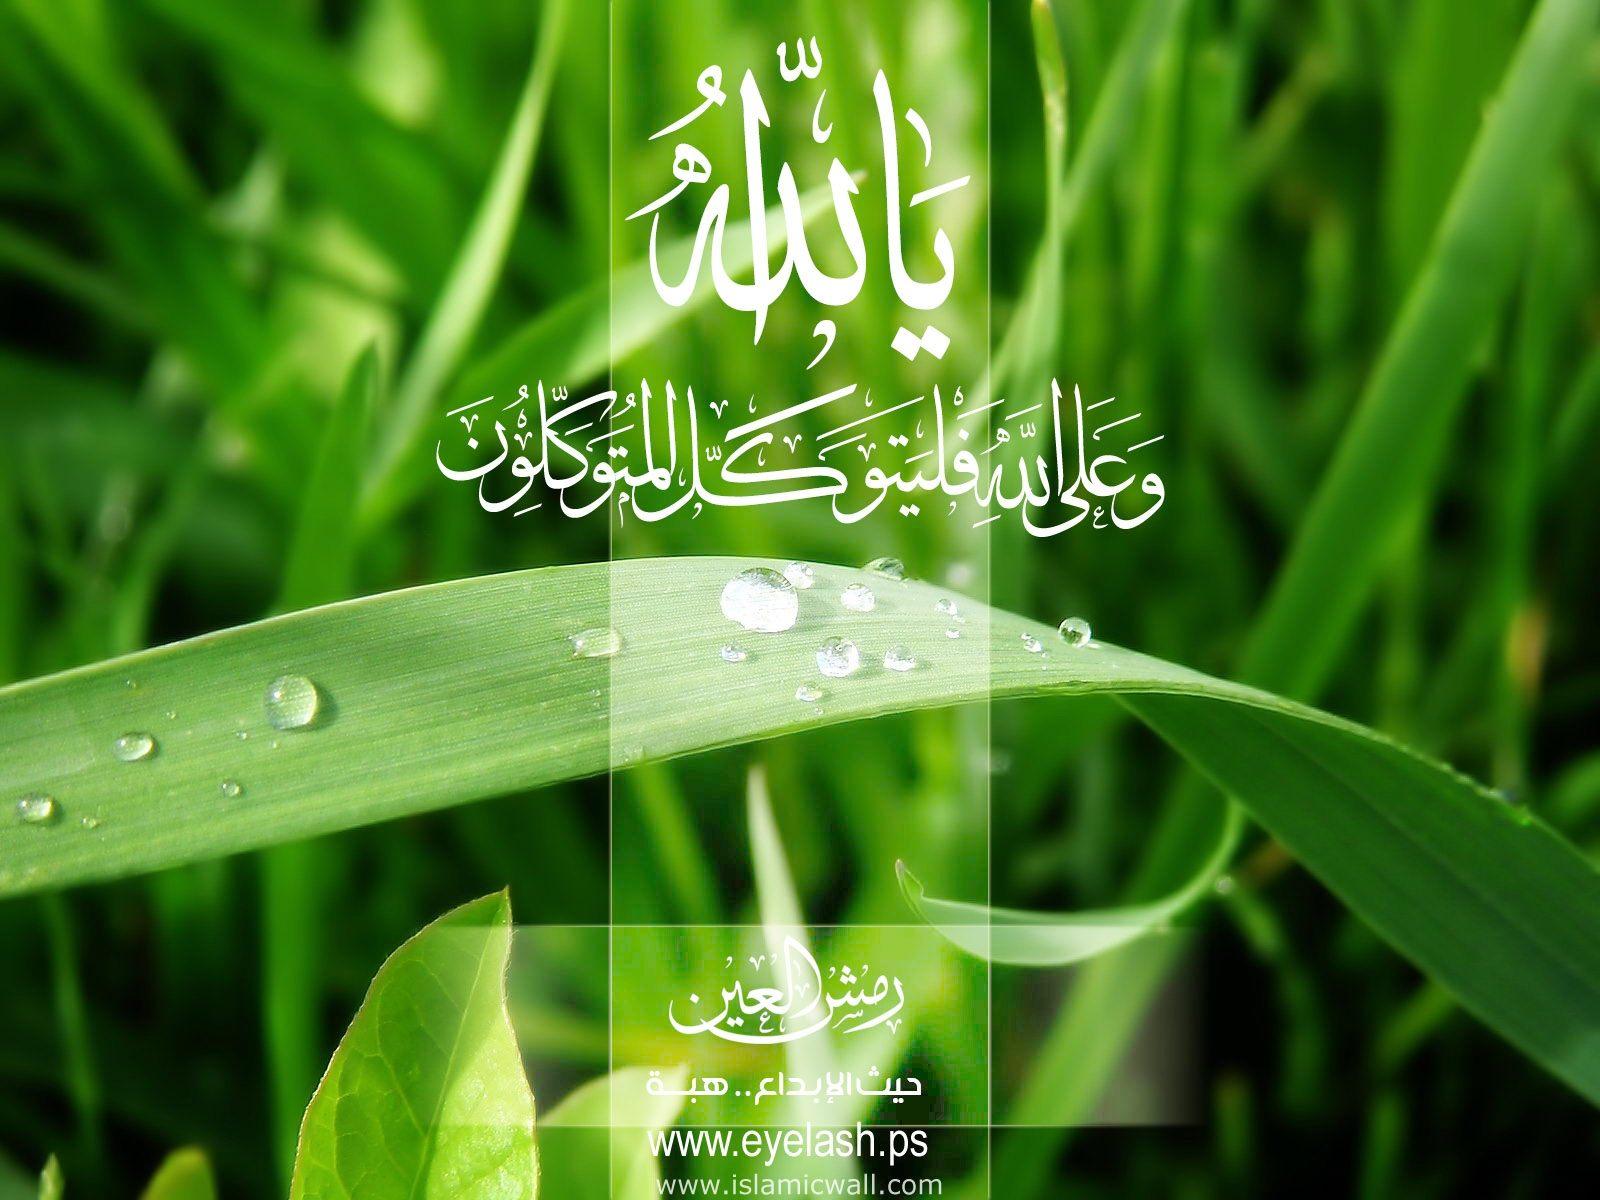 http://2.bp.blogspot.com/-BnpXZuLt9z8/T9BxJggcVrI/AAAAAAAAAng/eMsLm0YHKhM/s1600/Islamic_Wallpaper_by_neossonnic.jpg